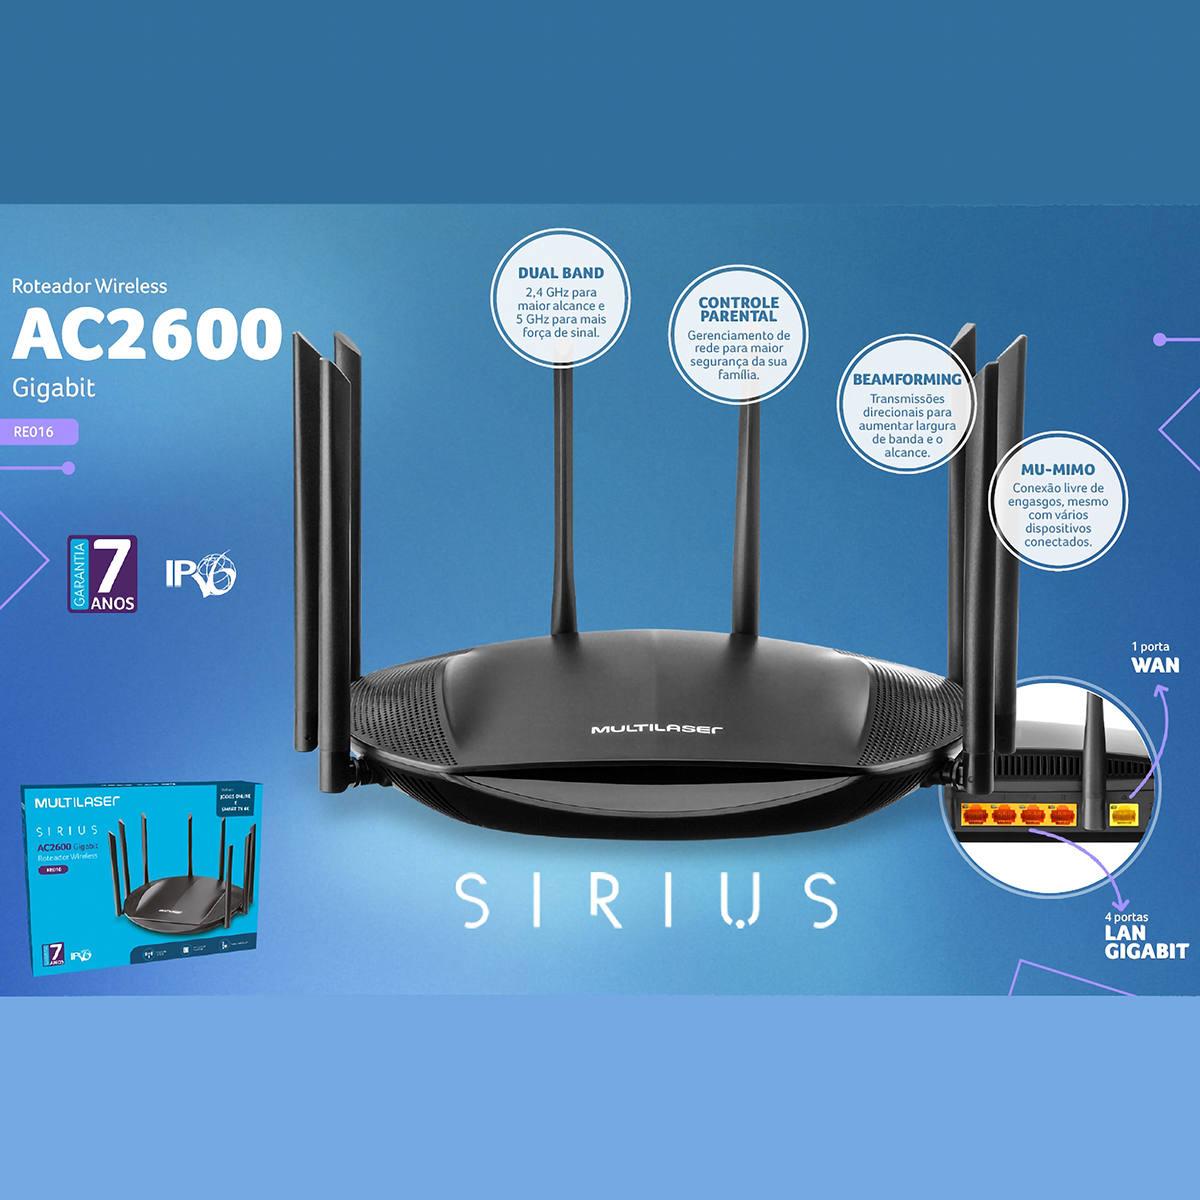 Roteador Gigabit Wireless 8 Antenas 2600Mbps Dual Band Ideal para Jogos Online e Smart TV 4K Sirius AC2600 RE016